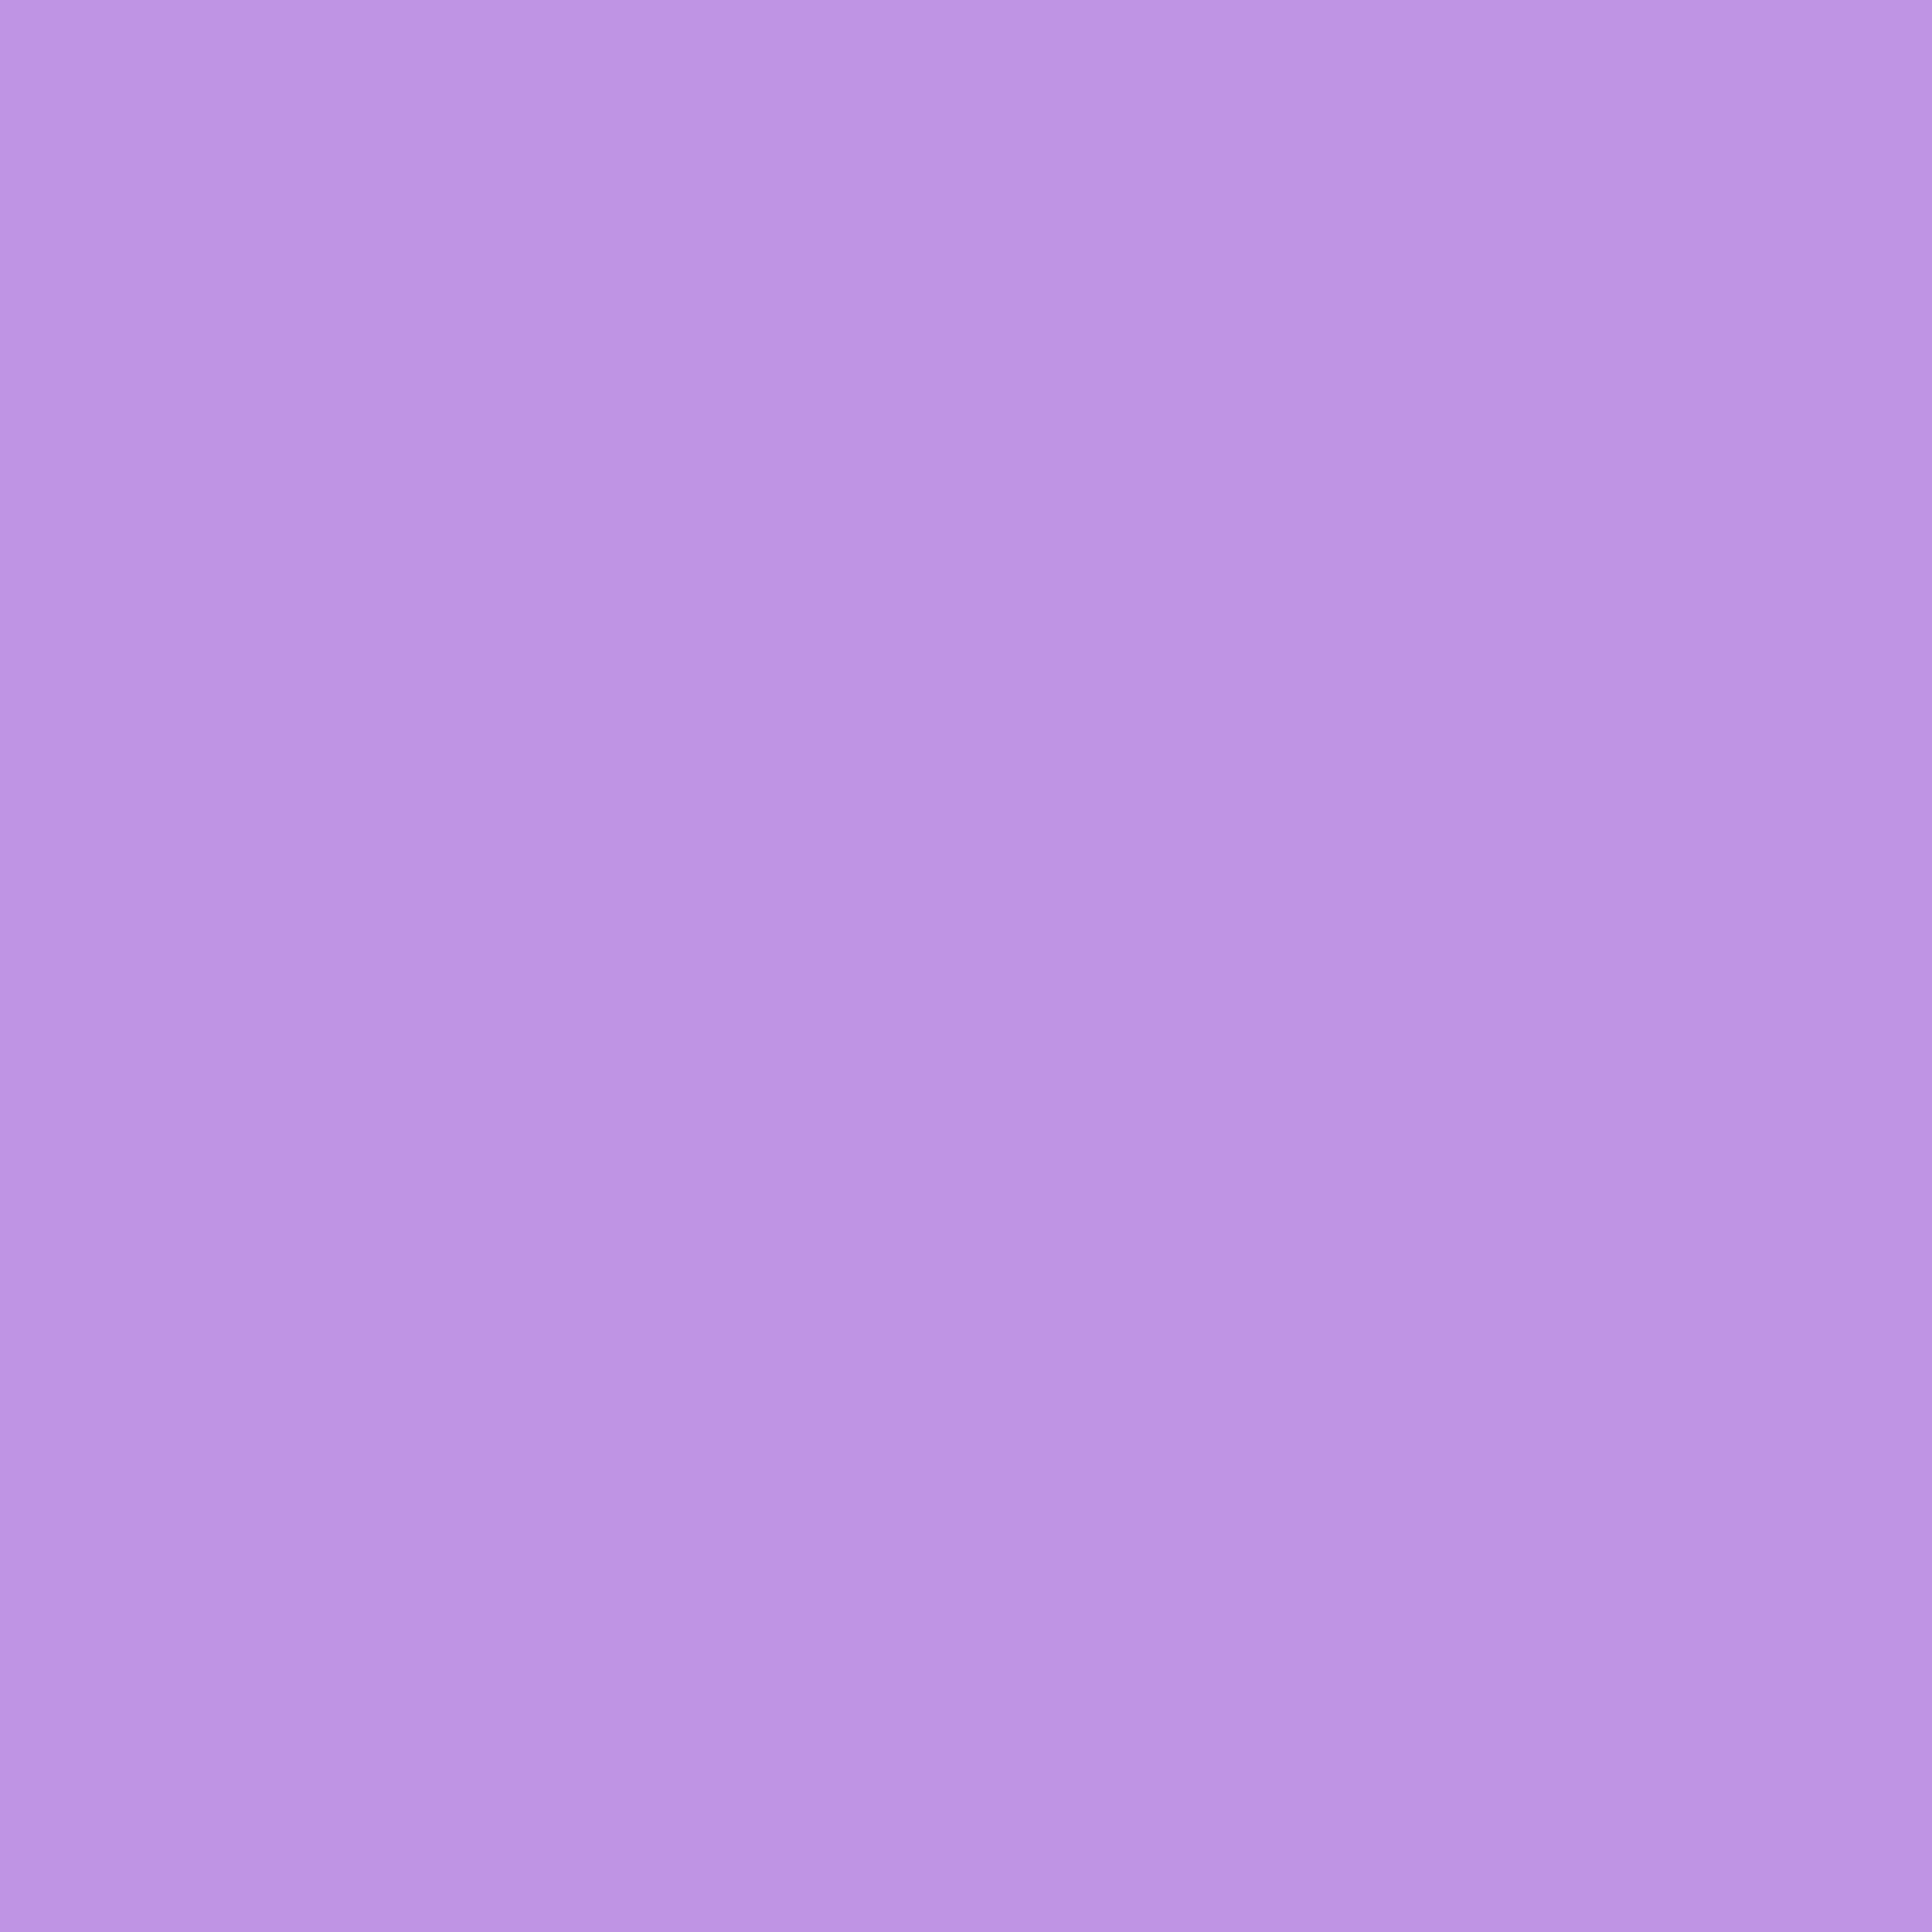 Bright Lavender Solid Color Background